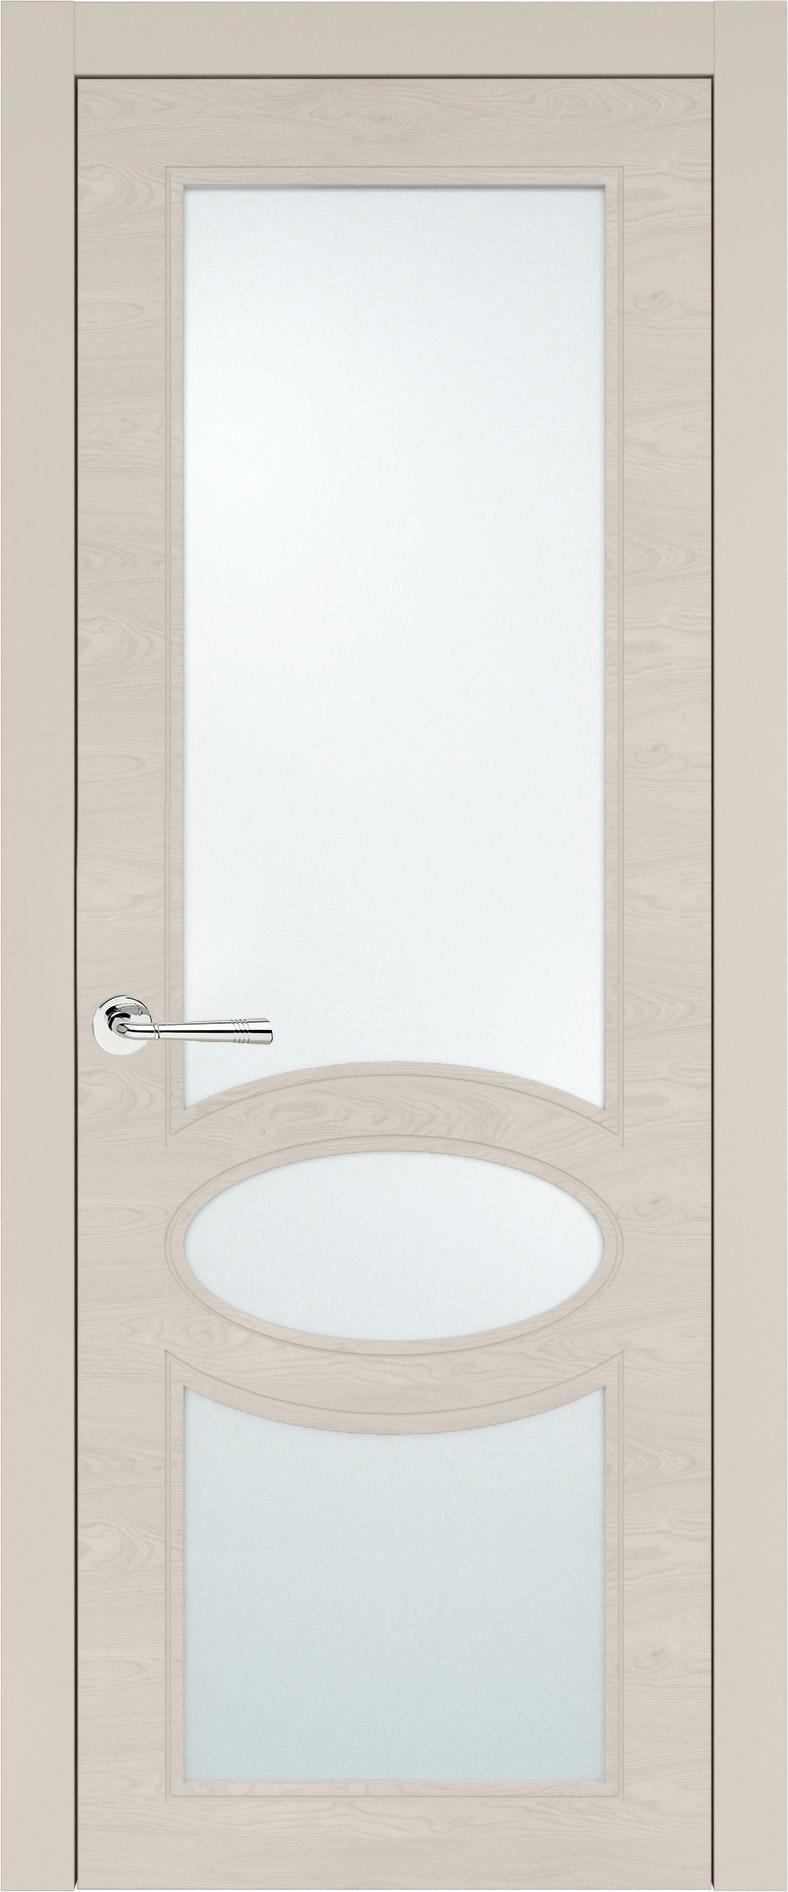 Florencia Neo Classic цвет - Жемчужная эмаль по шпону (RAL 1013) Со стеклом (ДО)